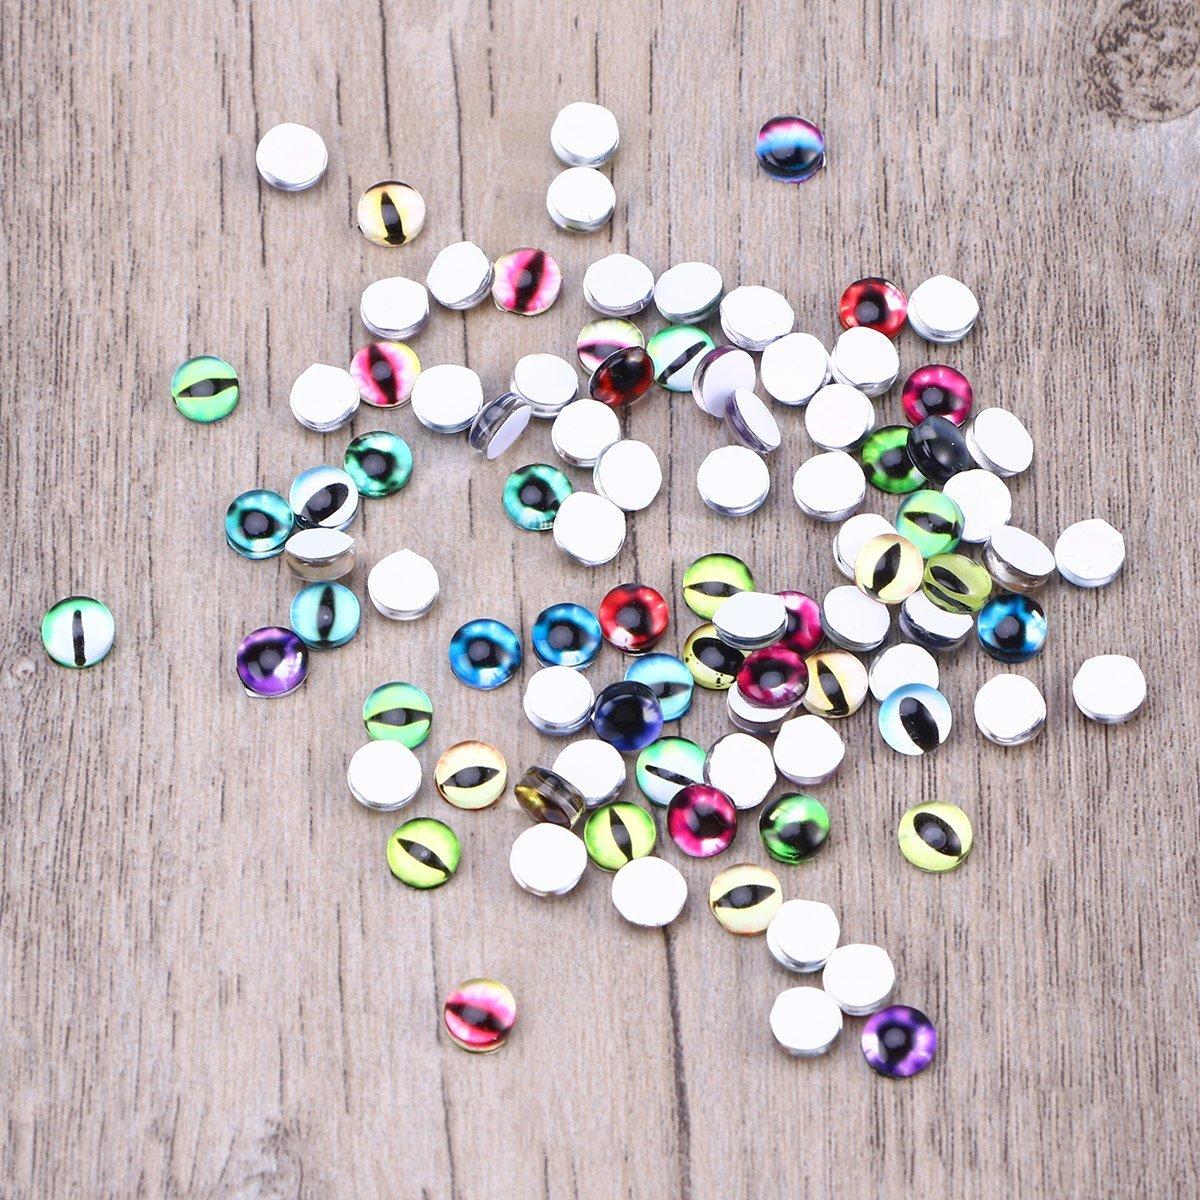 Healifty 100 PCS 6mm Mixed Eye Mosaic Tiles Dome Cabochons Glass Gemstone para Manualidades Fabricaci/ón de Joyas